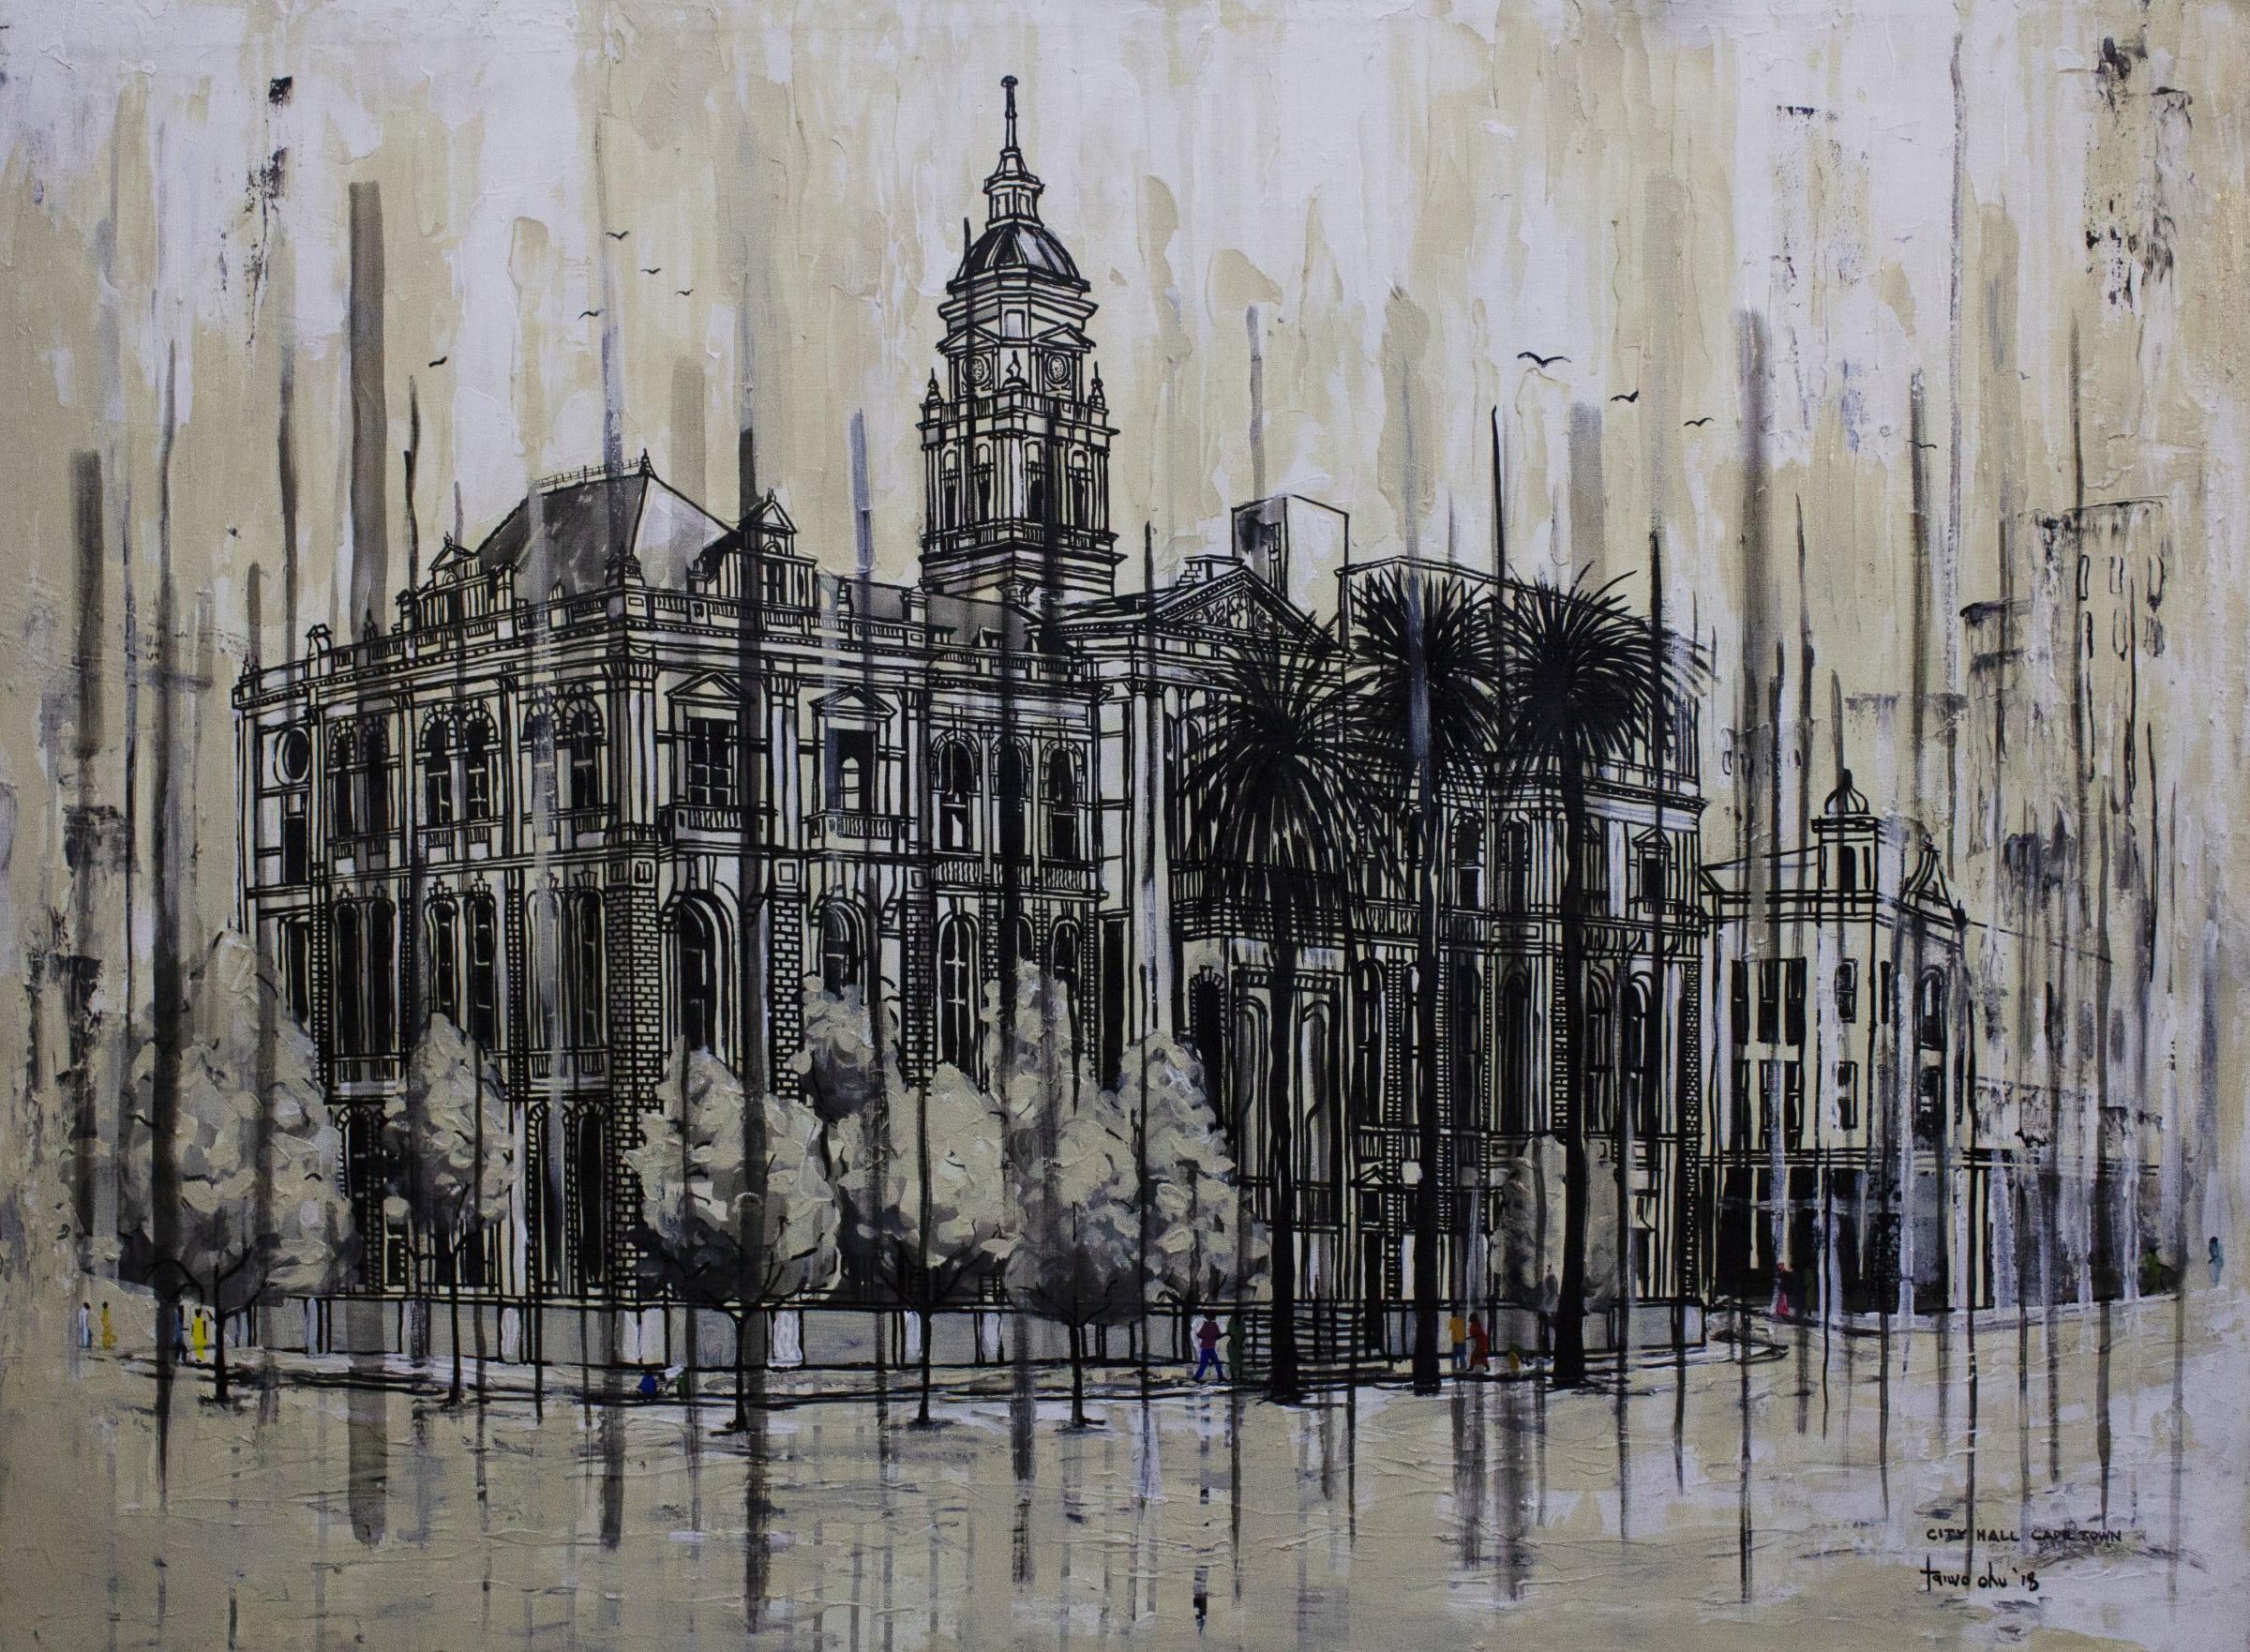 <span class=&#34;link fancybox-details-link&#34;><a href=&#34;/artworks/categories/121/2932-taiwo-ohu-cape-town-city-hall-2018/&#34;>View Detail Page</a></span><div class=&#34;artist&#34;><strong>Taiwo Ohu</strong></div> <div class=&#34;title&#34;><em>Cape Town City Hall</em>, 2018</div> <div class=&#34;medium&#34;>Acrylic On Canvas </div> <div class=&#34;dimensions&#34;>90cm x 120cm</div><div class=&#34;price&#34;>R13,000.00</div>